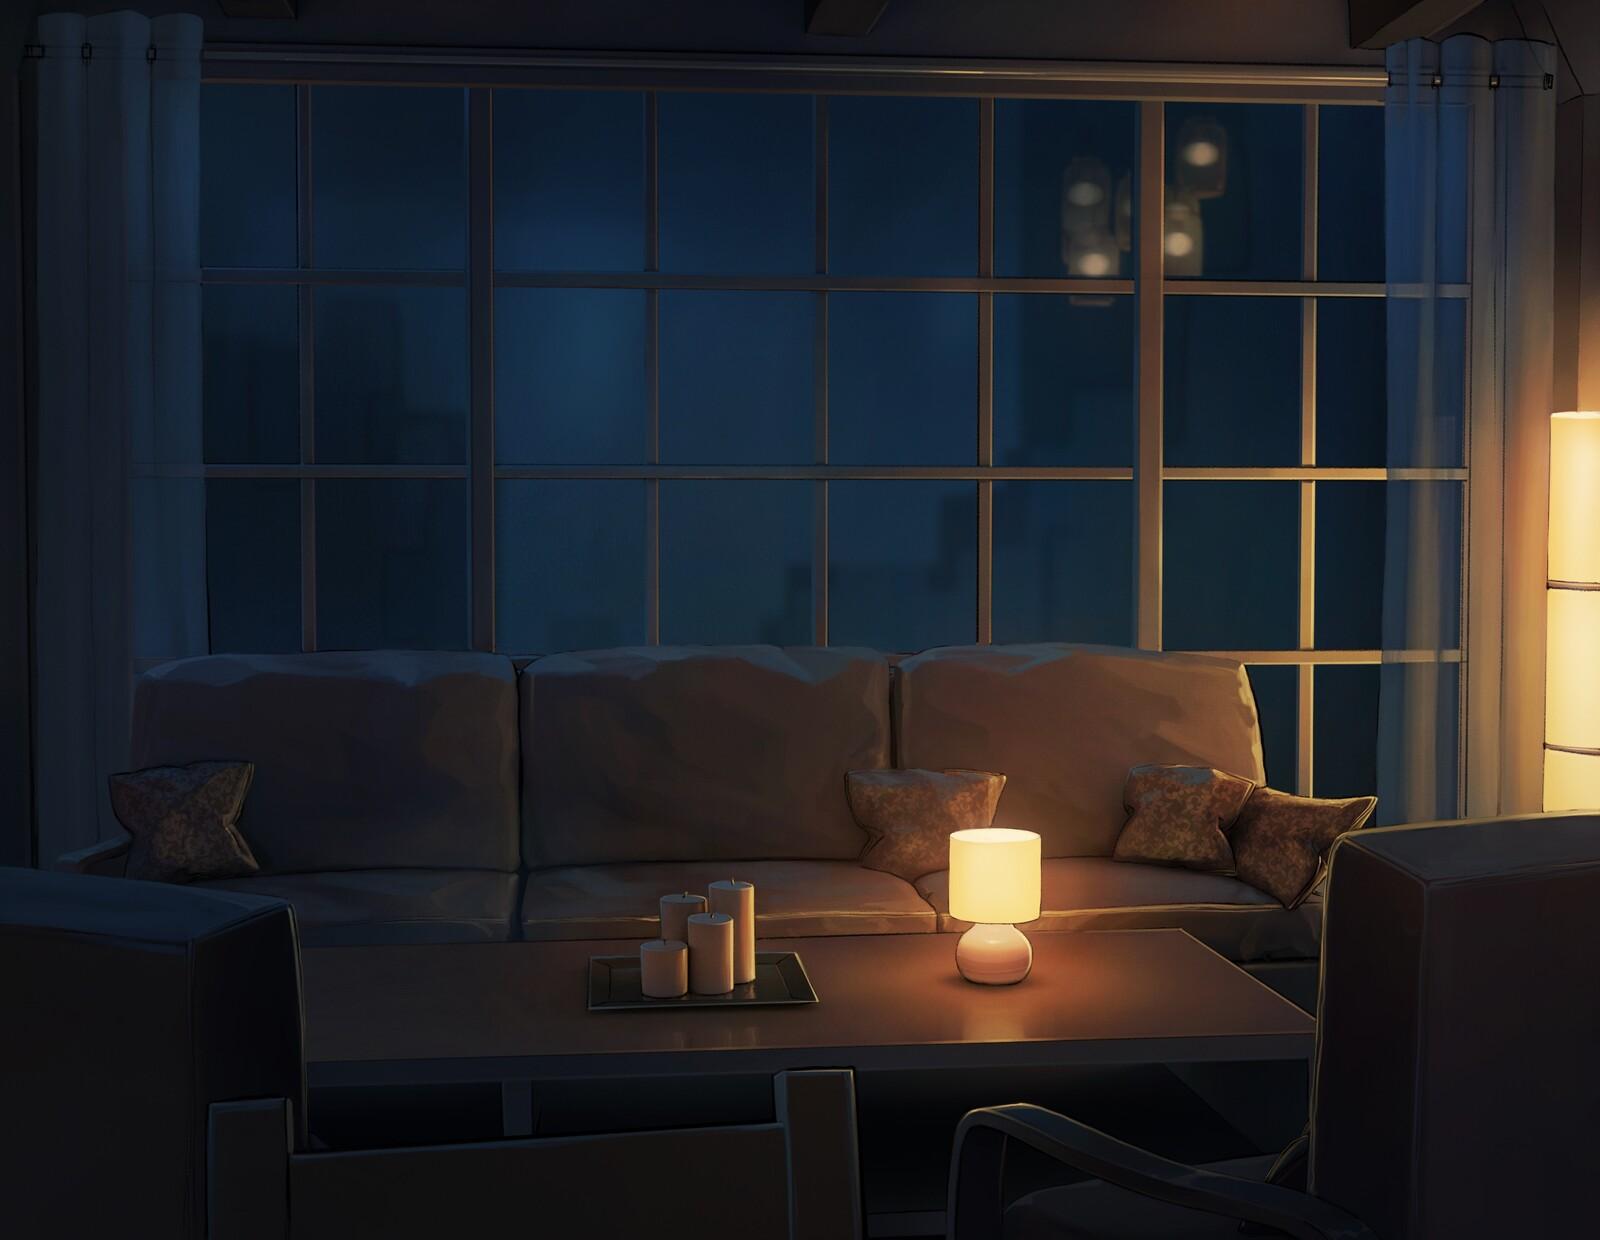 Visual novel Backgrounds - Apartment & Living room